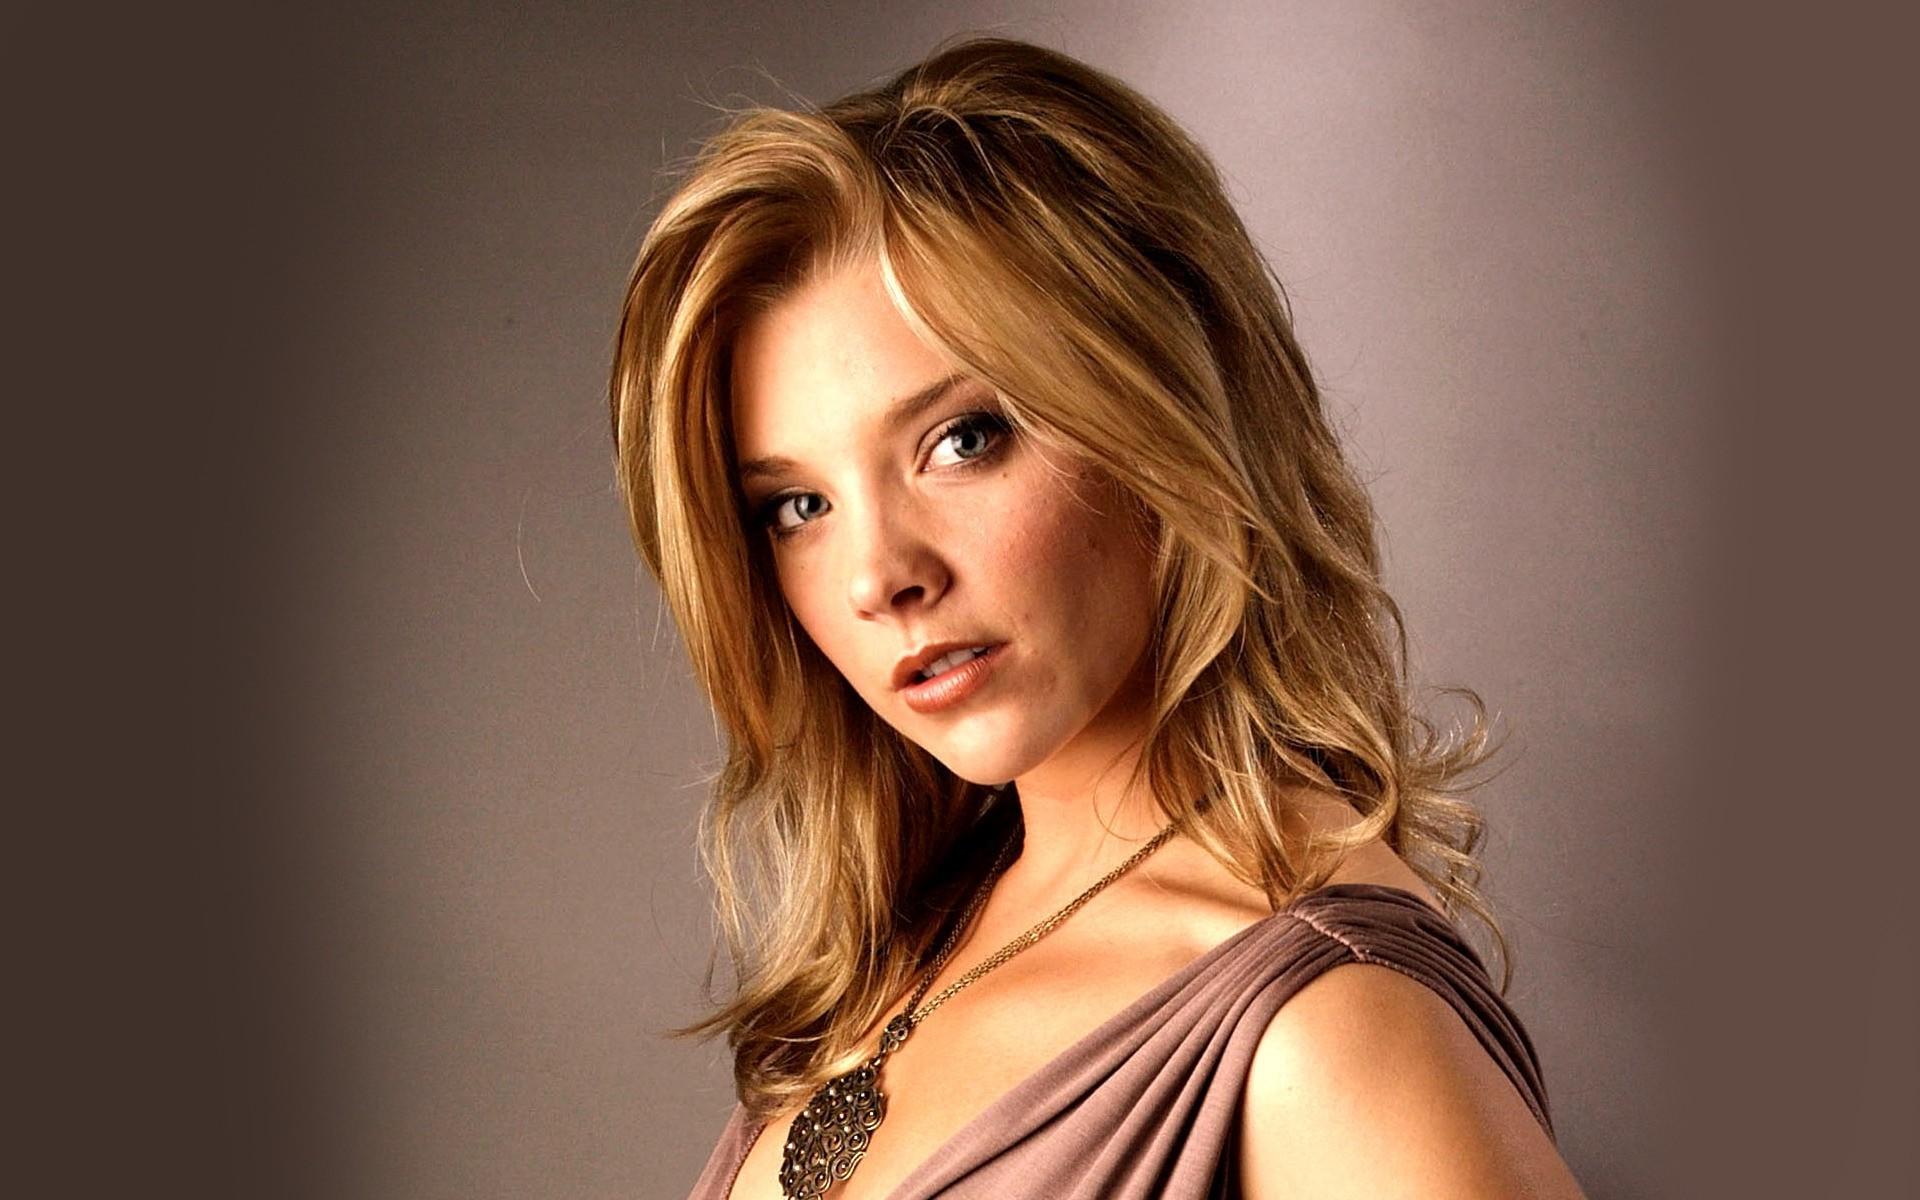 Natalie-Dormer-HD-Background